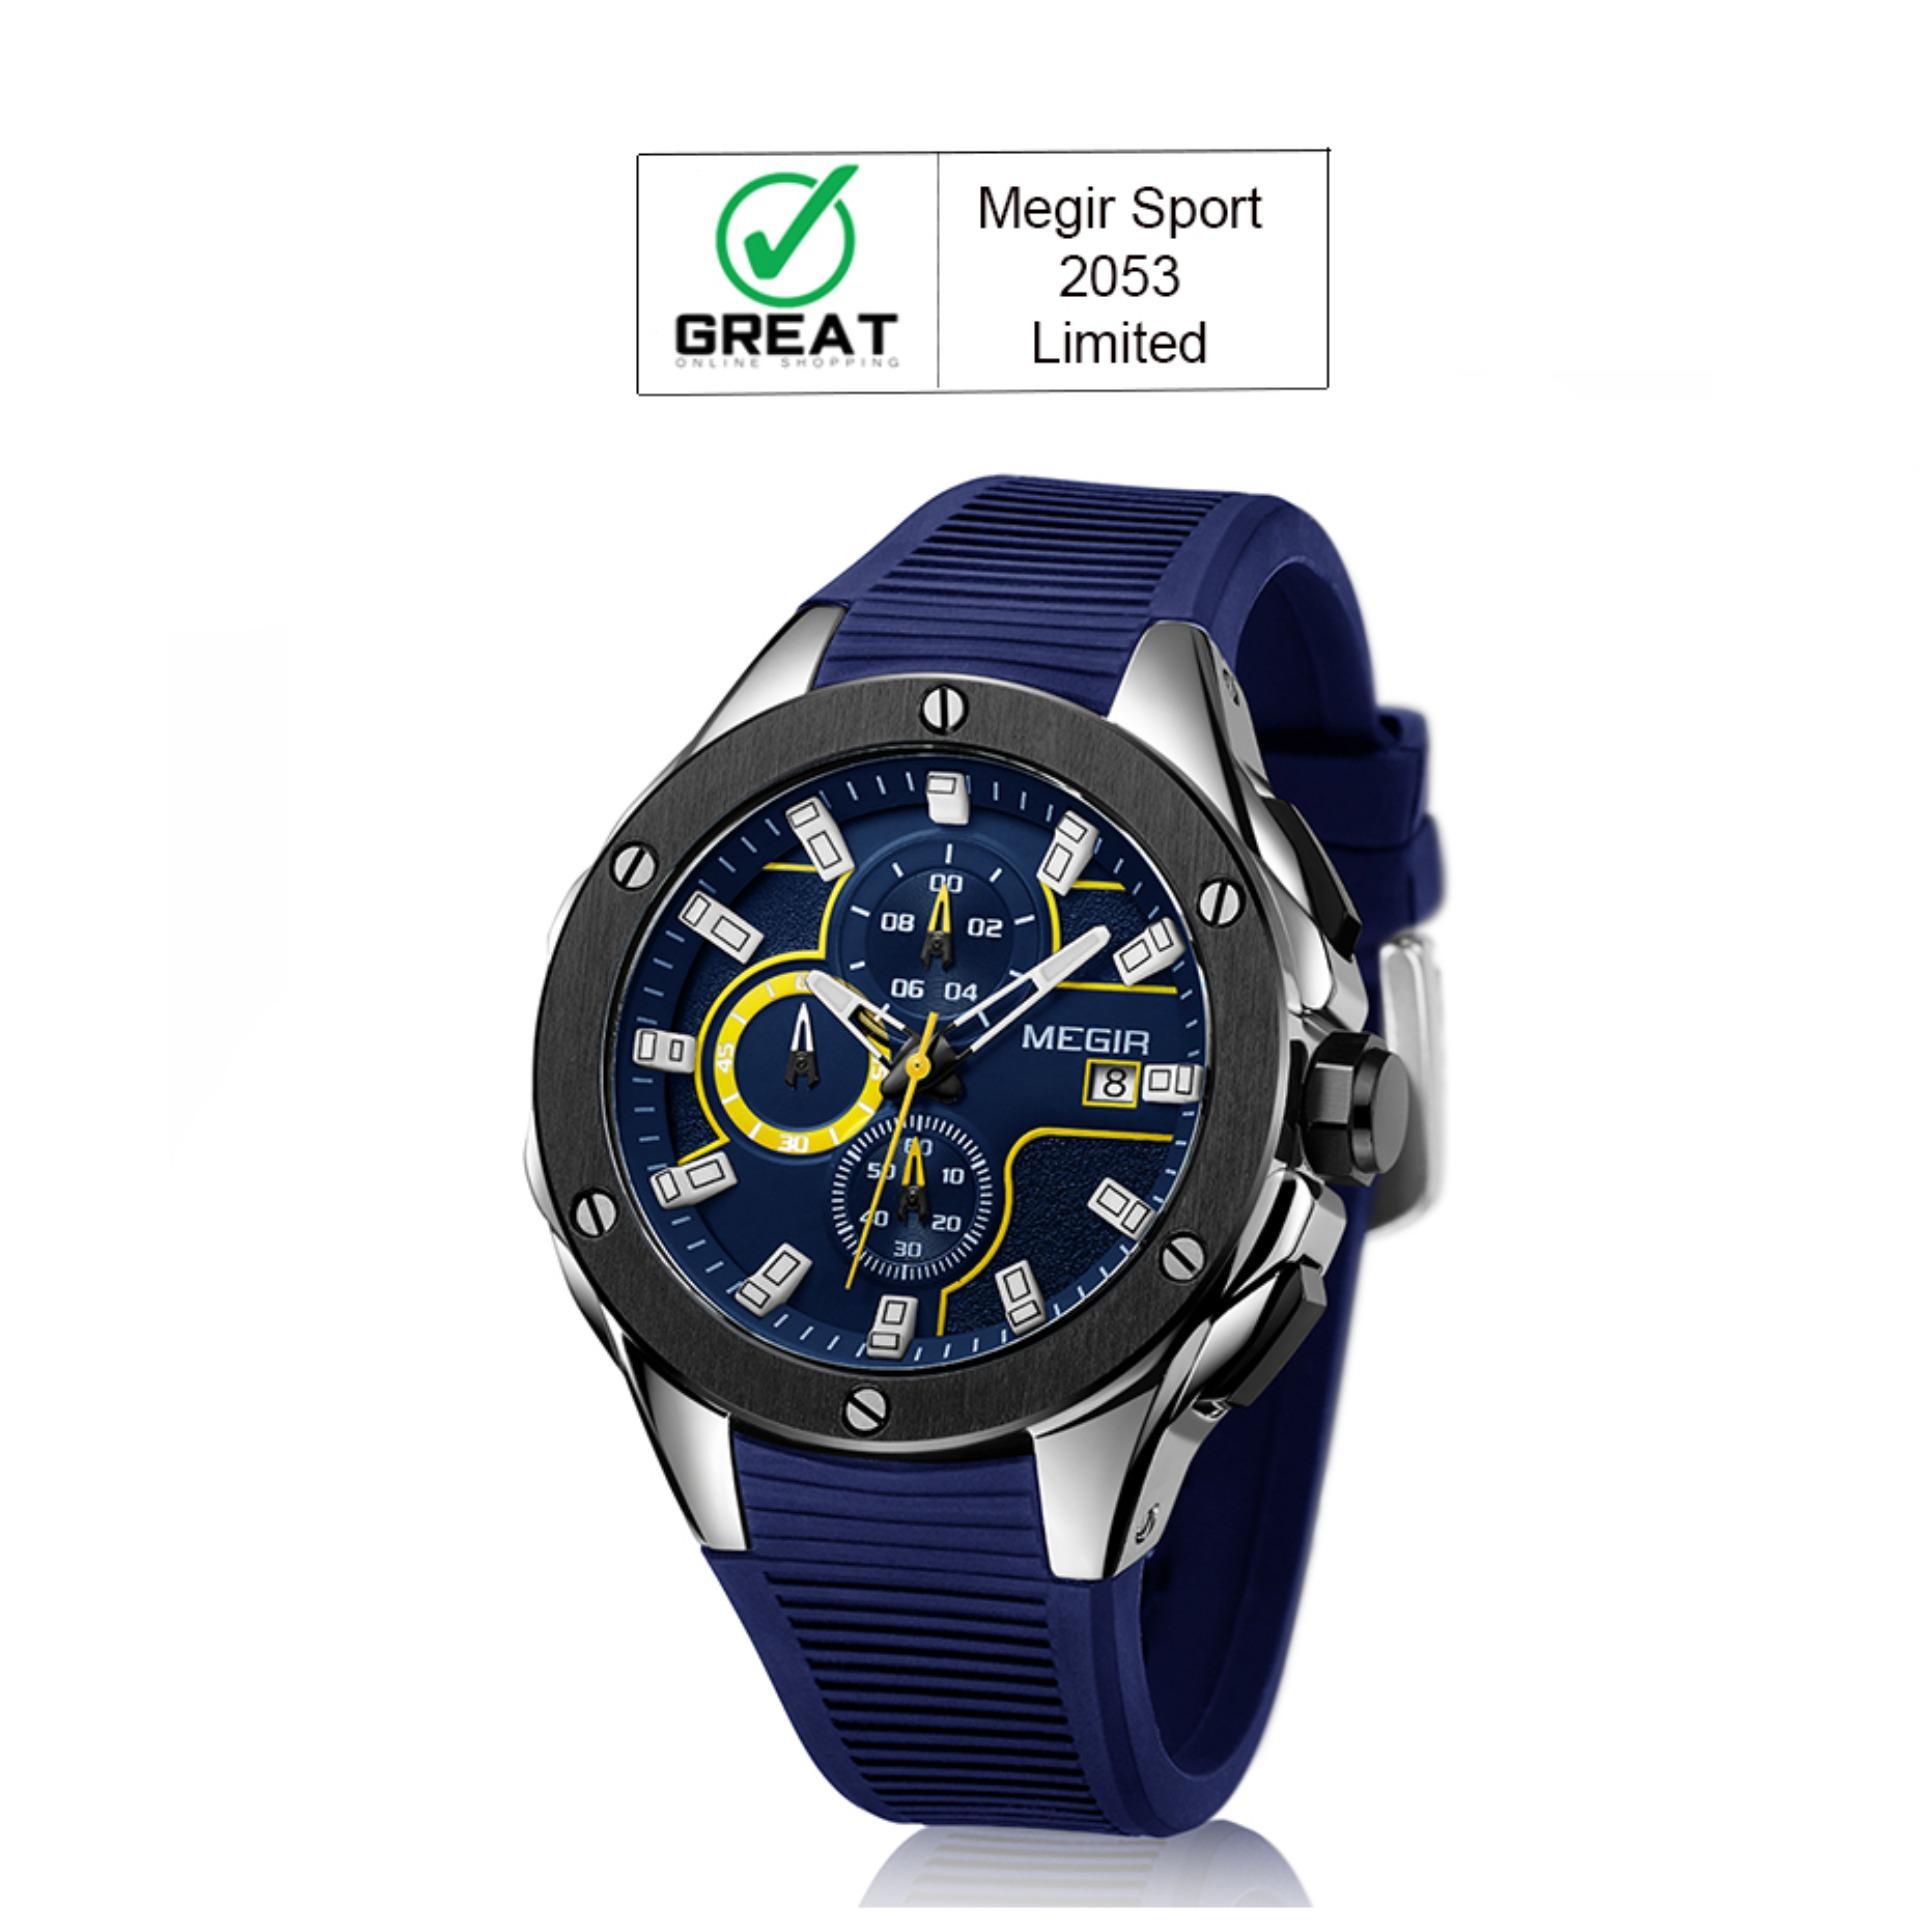 MEGIR MN2053G Jam Tangan Pria Sport Watch Chronograph Tali Silikon Kuarsa Jam Tangan Army Militer Anti Air - Biru